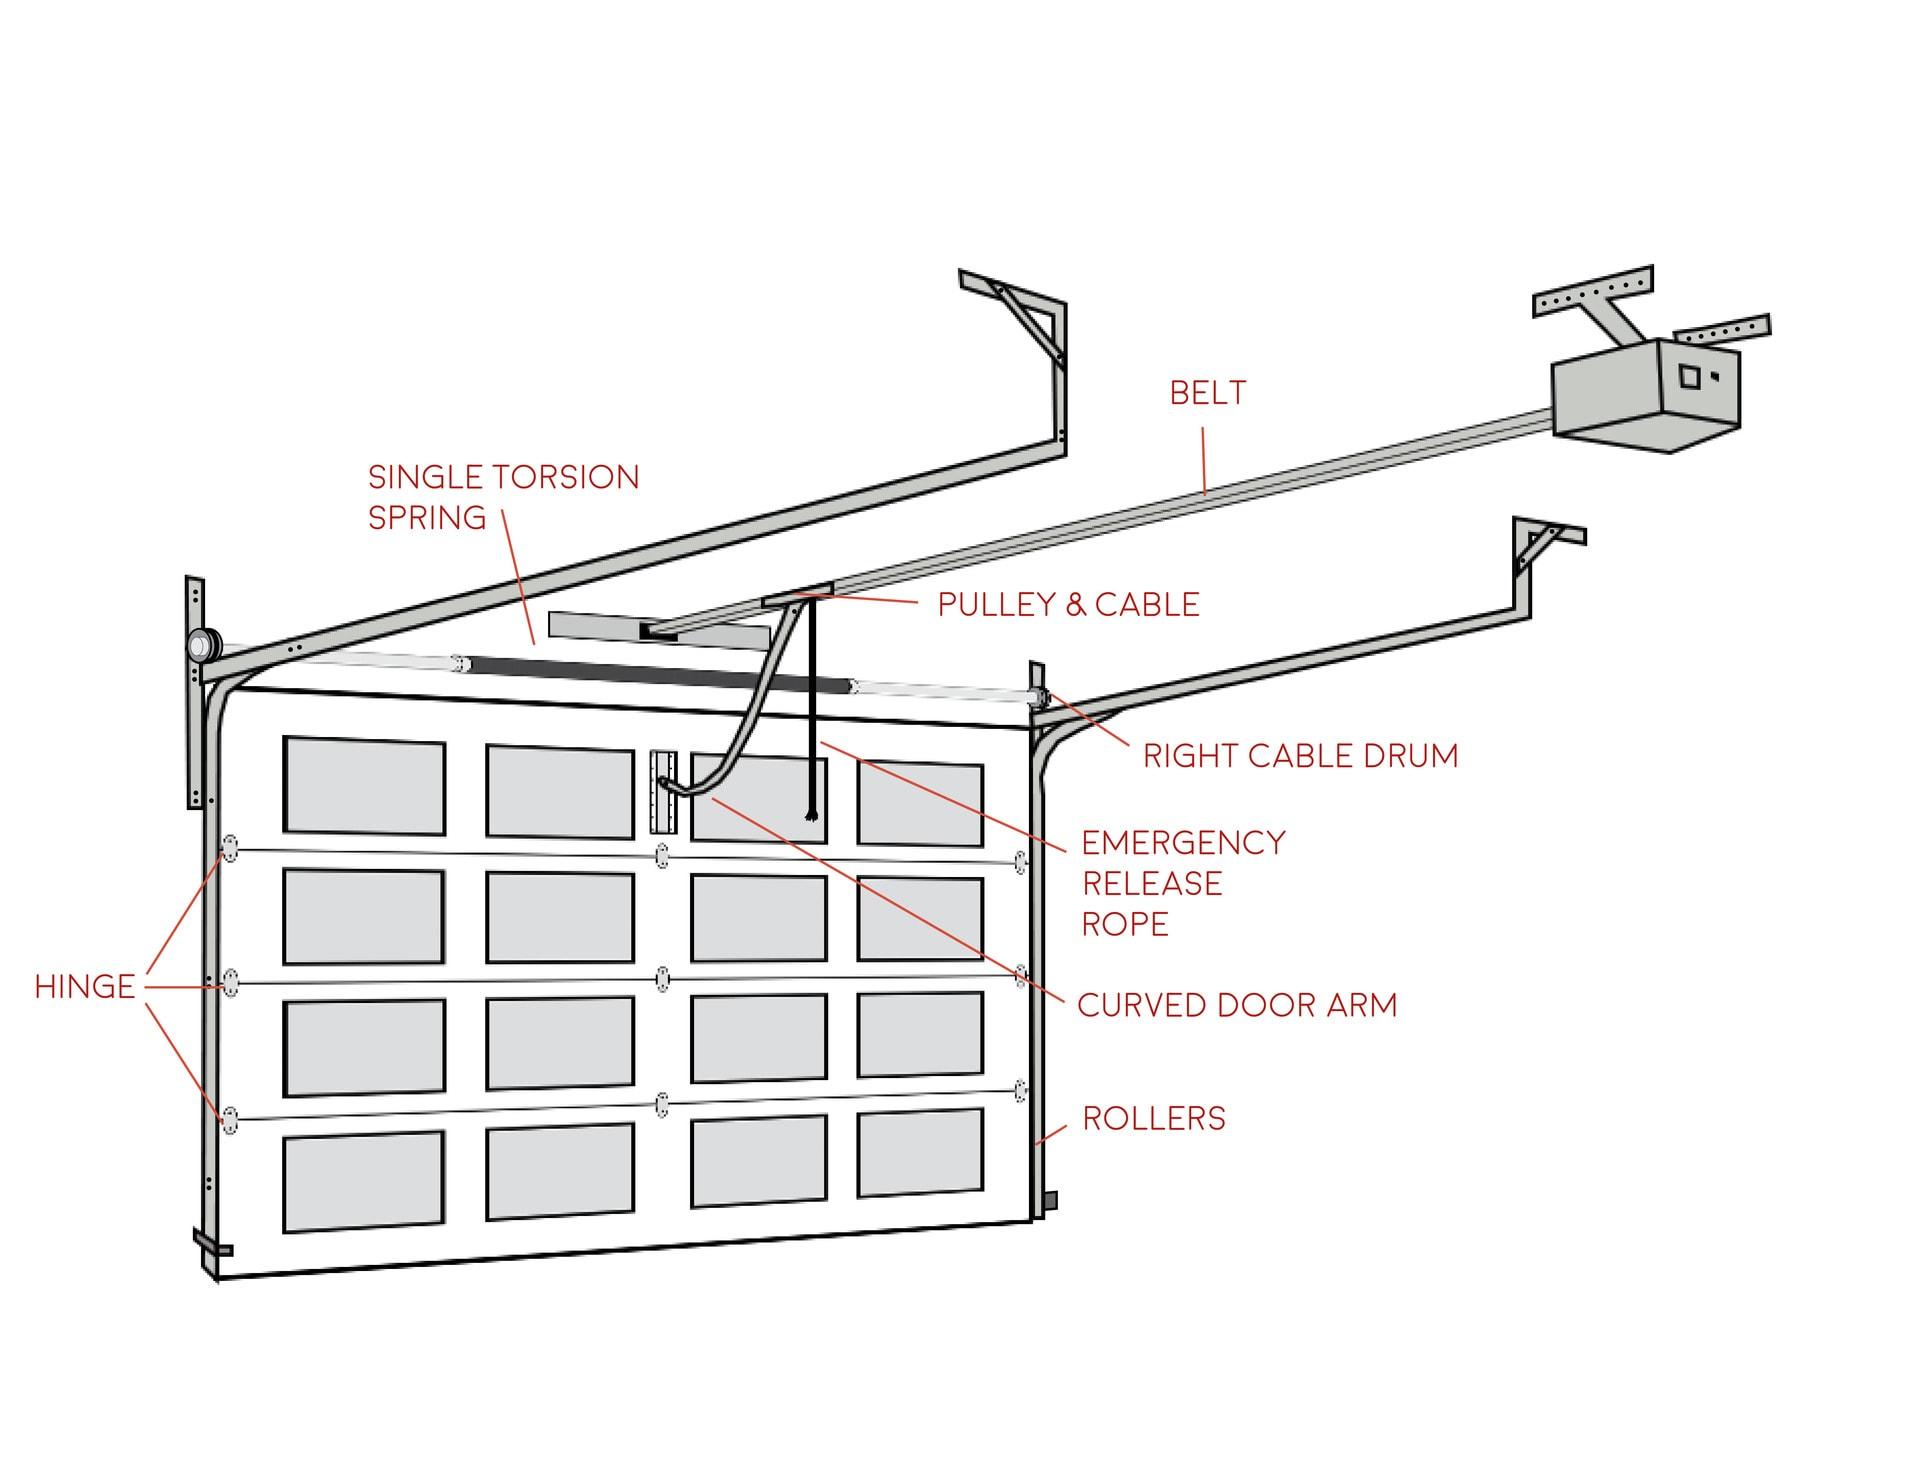 Swell Gallery Jb Garage Door Repair Las Vegas Nv Garage Door Conversion Wiring Cloud Inklaidewilluminateatxorg